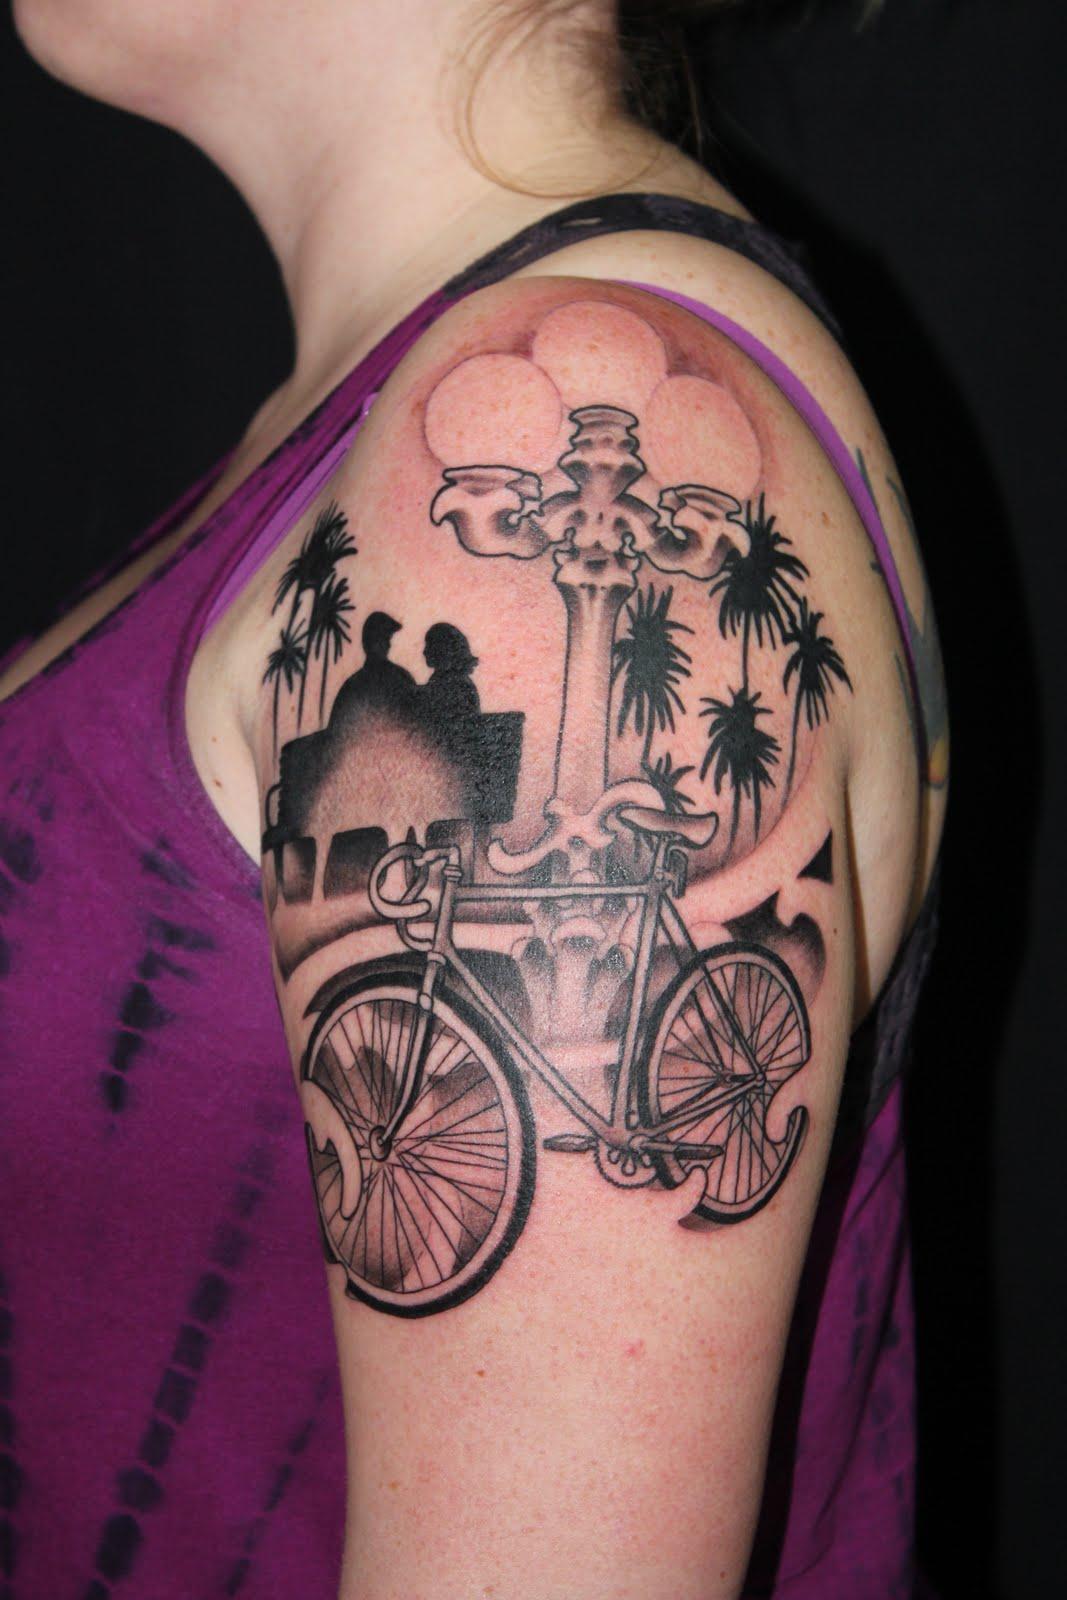 keller tattoos bicycle 1 2 sleeve. Black Bedroom Furniture Sets. Home Design Ideas